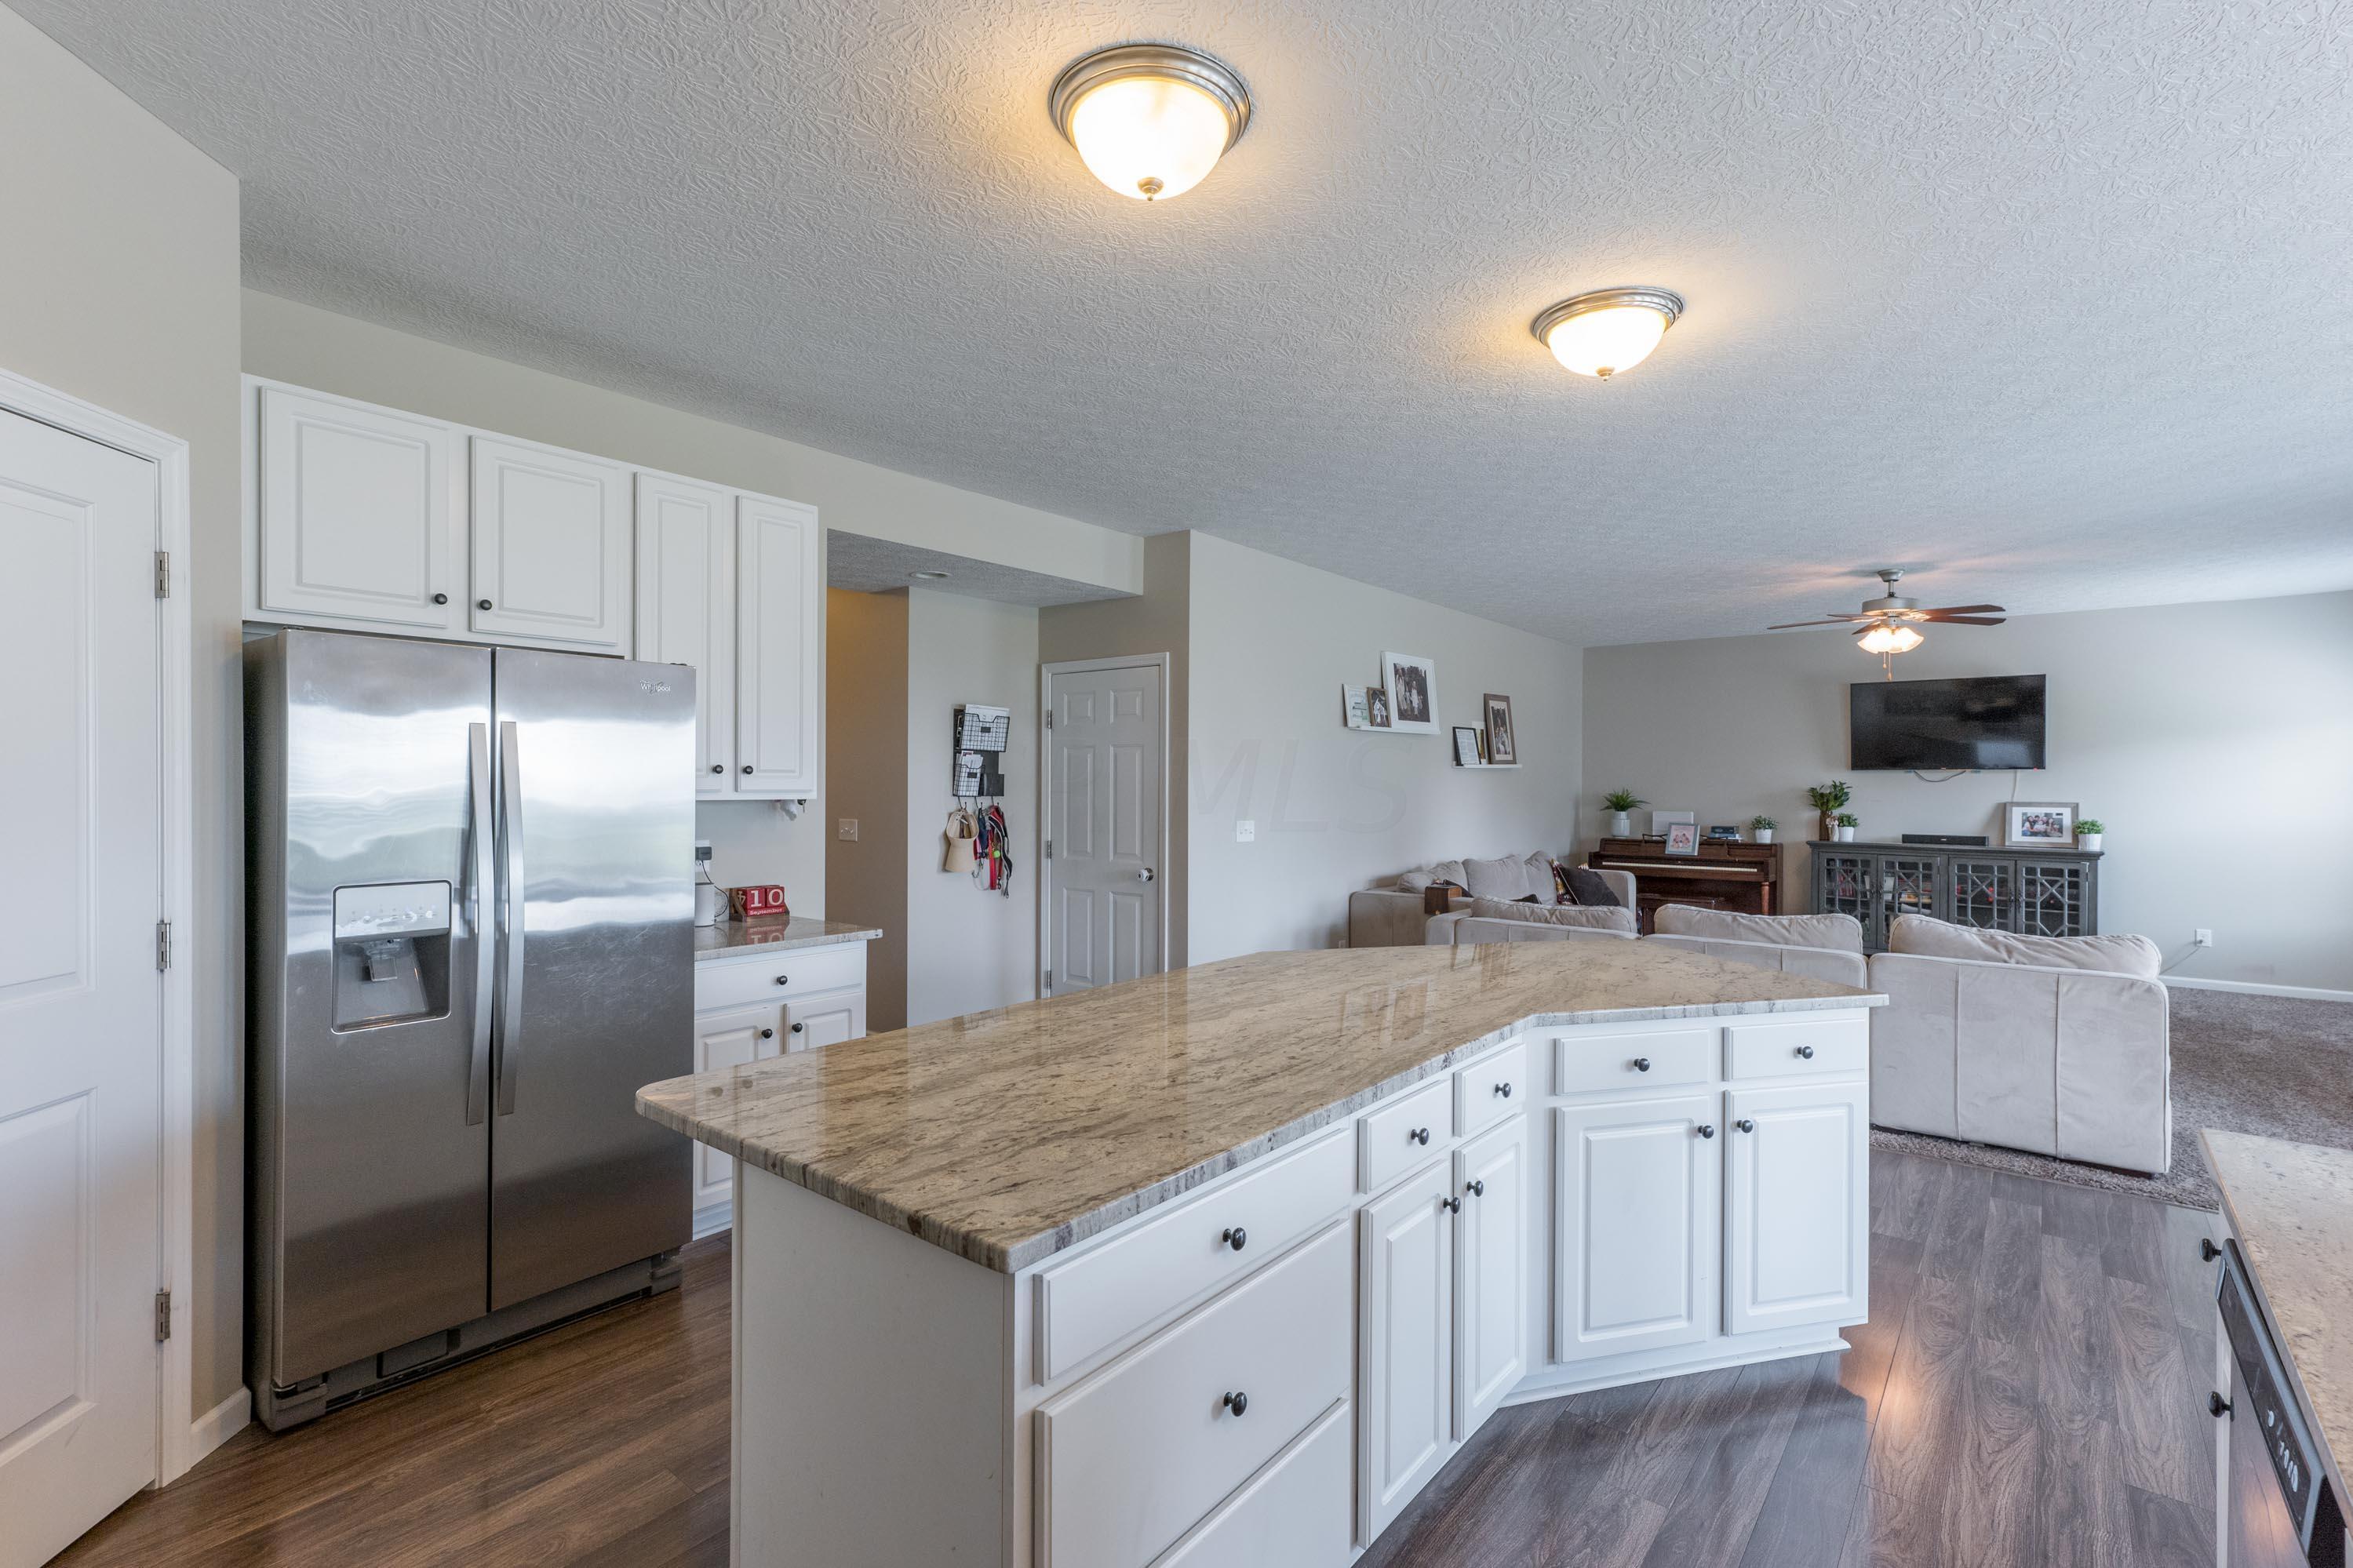 767 Oakley Drive, Delaware, Ohio 43015, 4 Bedrooms Bedrooms, ,3 BathroomsBathrooms,Residential,For Sale,Oakley,220032271